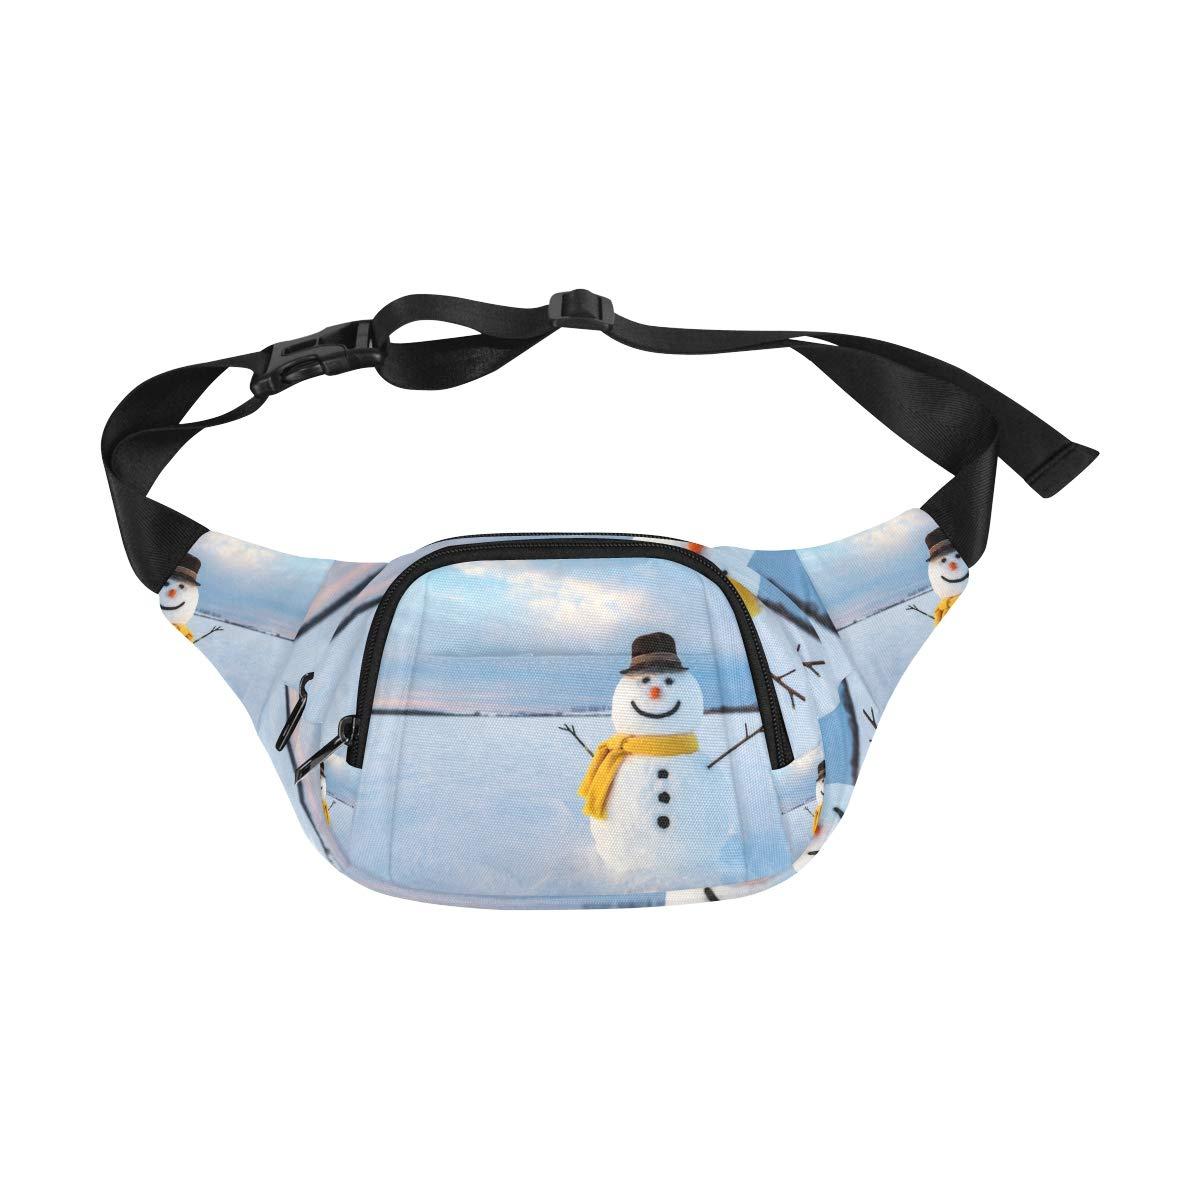 Happy White Snowman In Winter Fenny Packs Waist Bags Adjustable Belt Waterproof Nylon Travel Running Sport Vacation Party For Men Women Boys Girls Kids